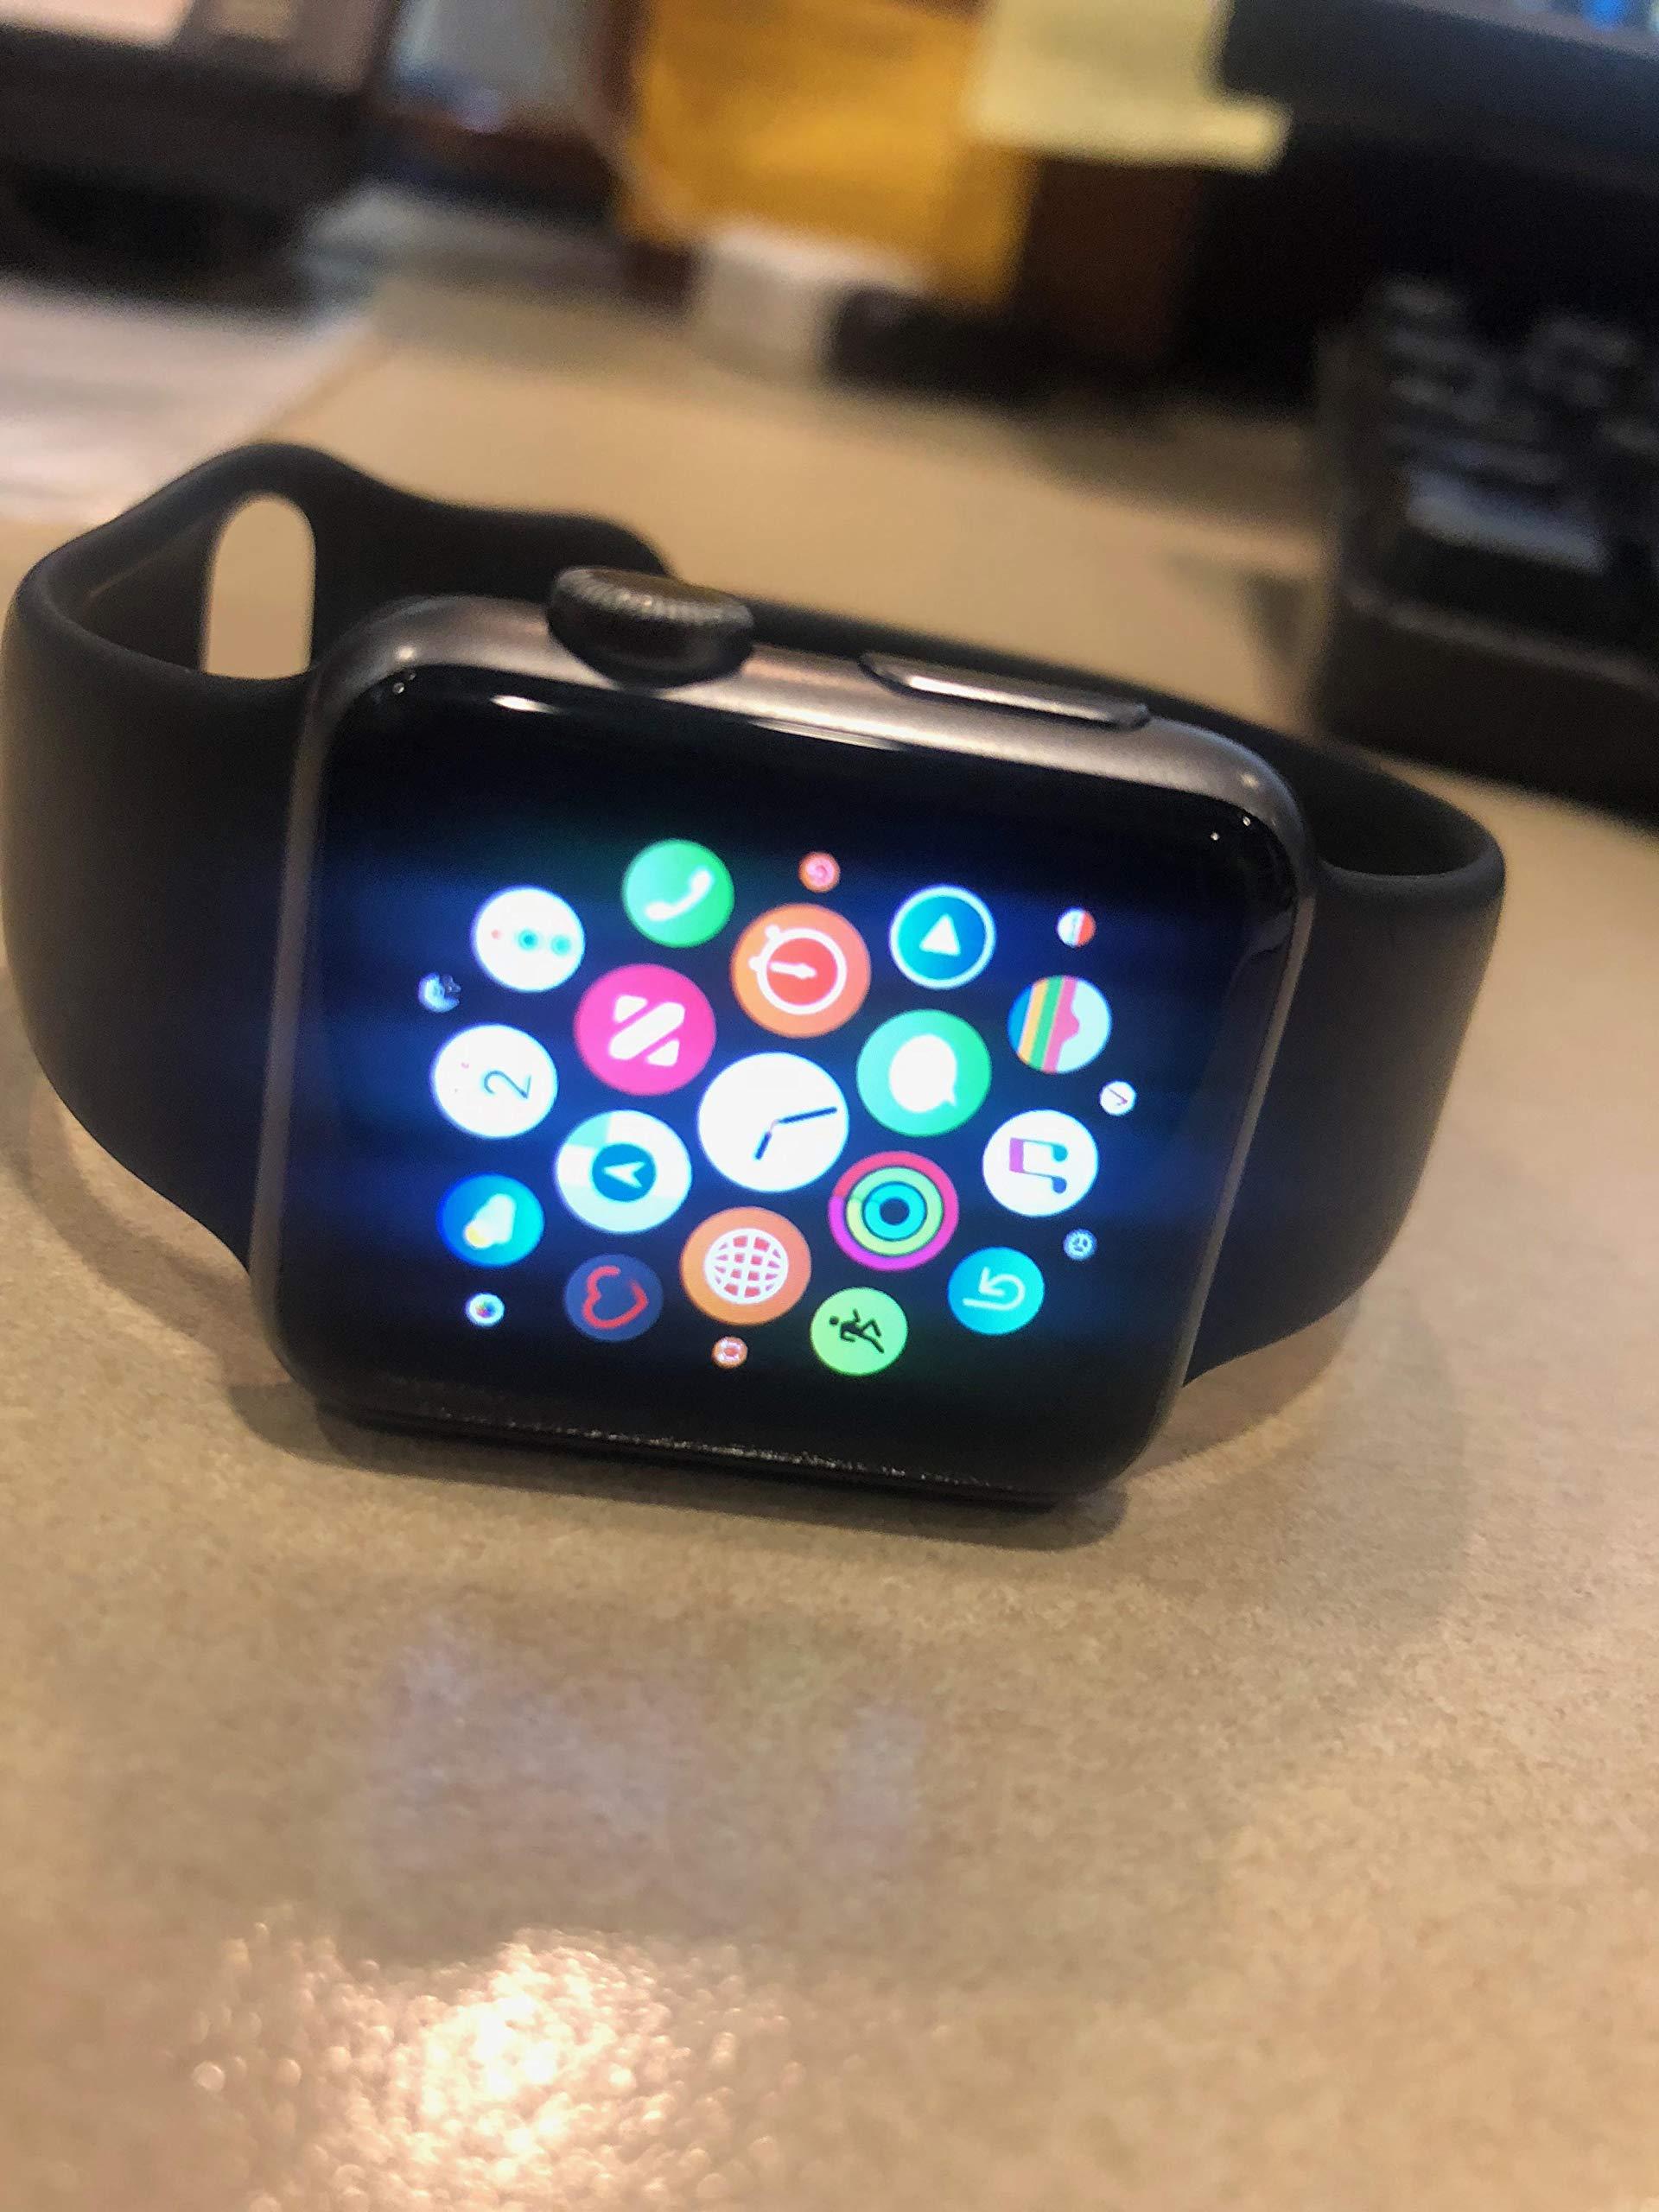 Apple Watch Series 1 Smartwatch (Space Gray Aluminum Case/Black Sport Band)